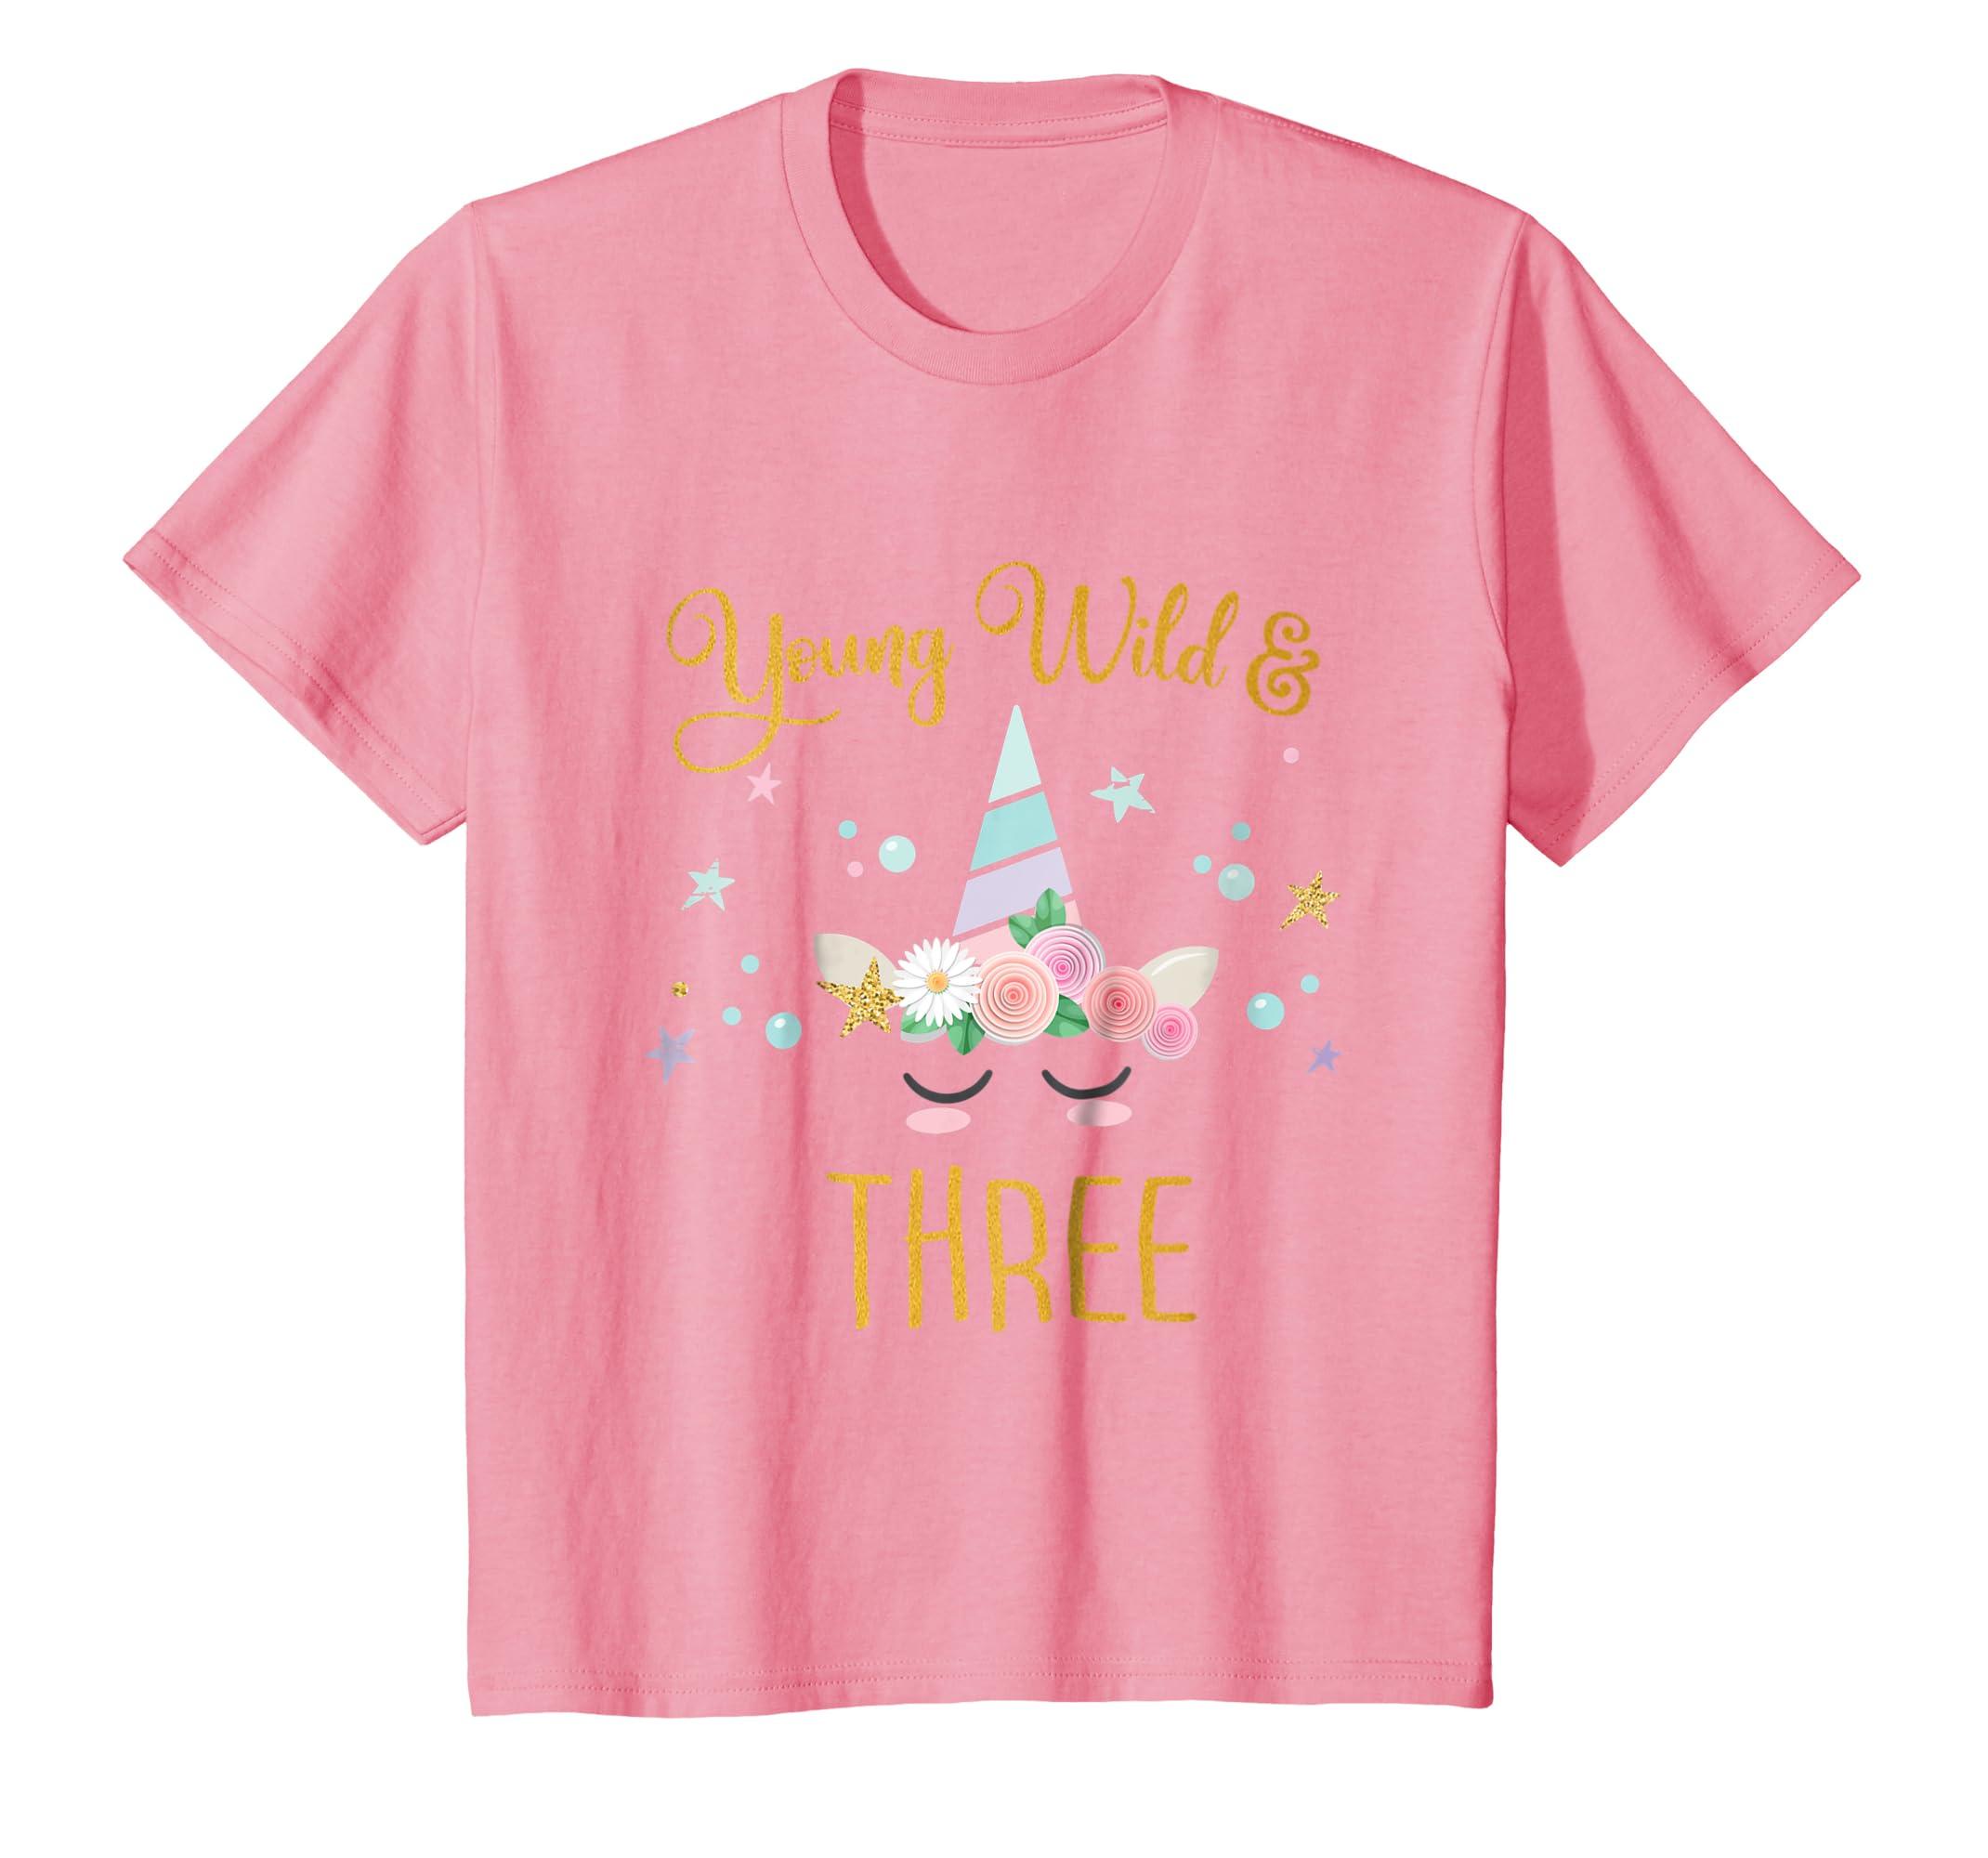 Amazon Young Wild And Three Tshirt Unicorn 3rd Birthday Kids Gift Clothing